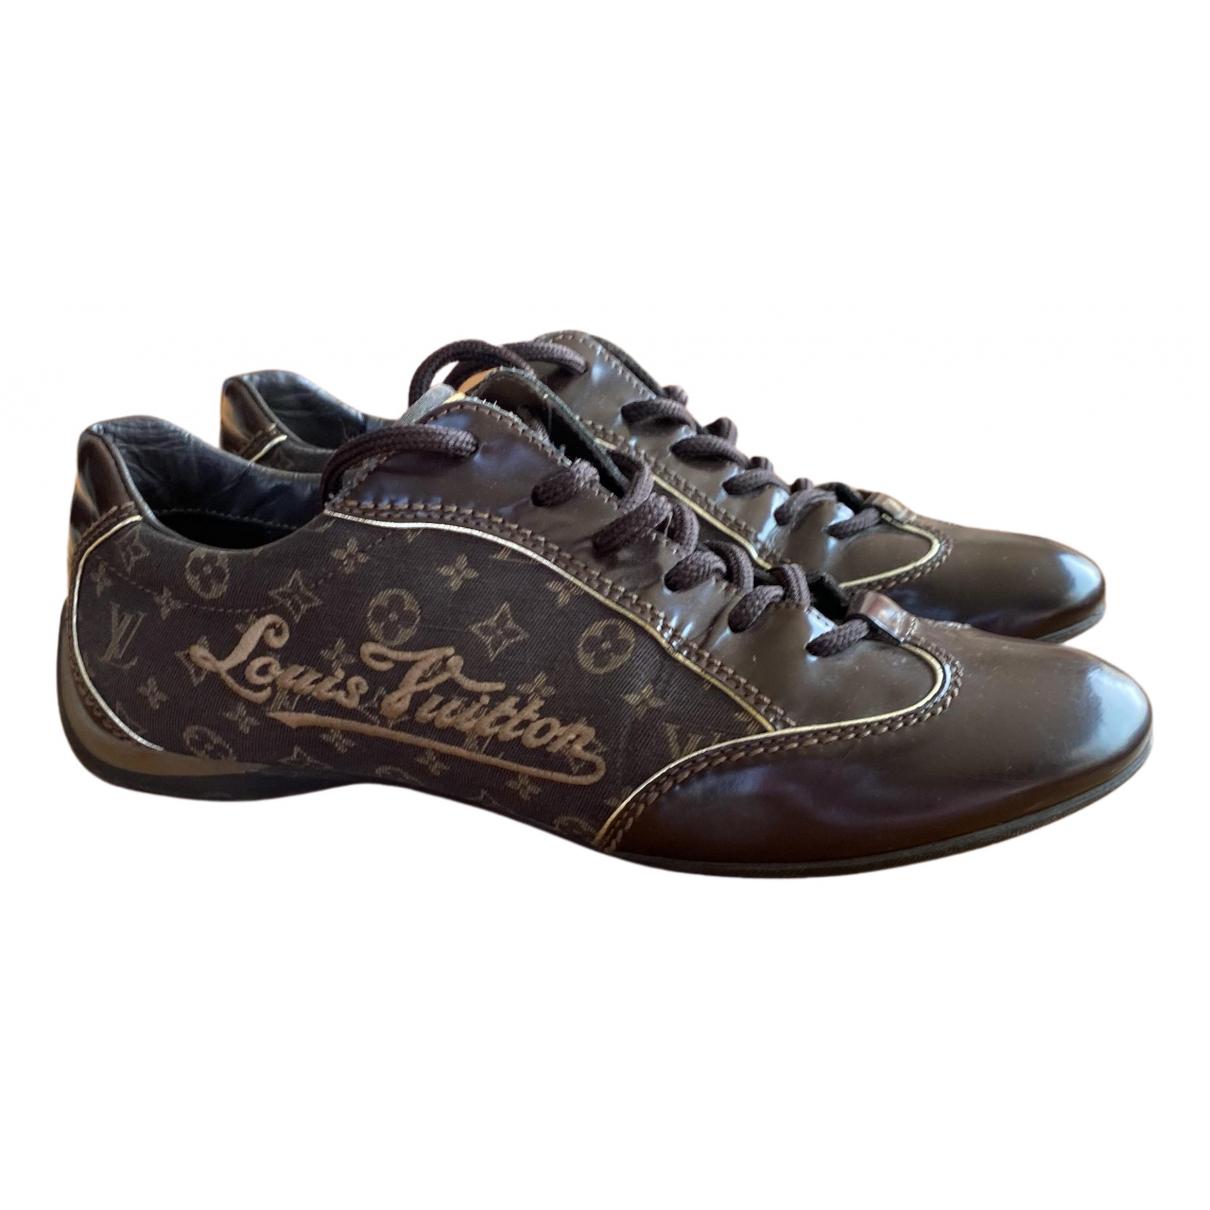 Louis Vuitton N Brown Cloth Trainers for Women 35.5 EU